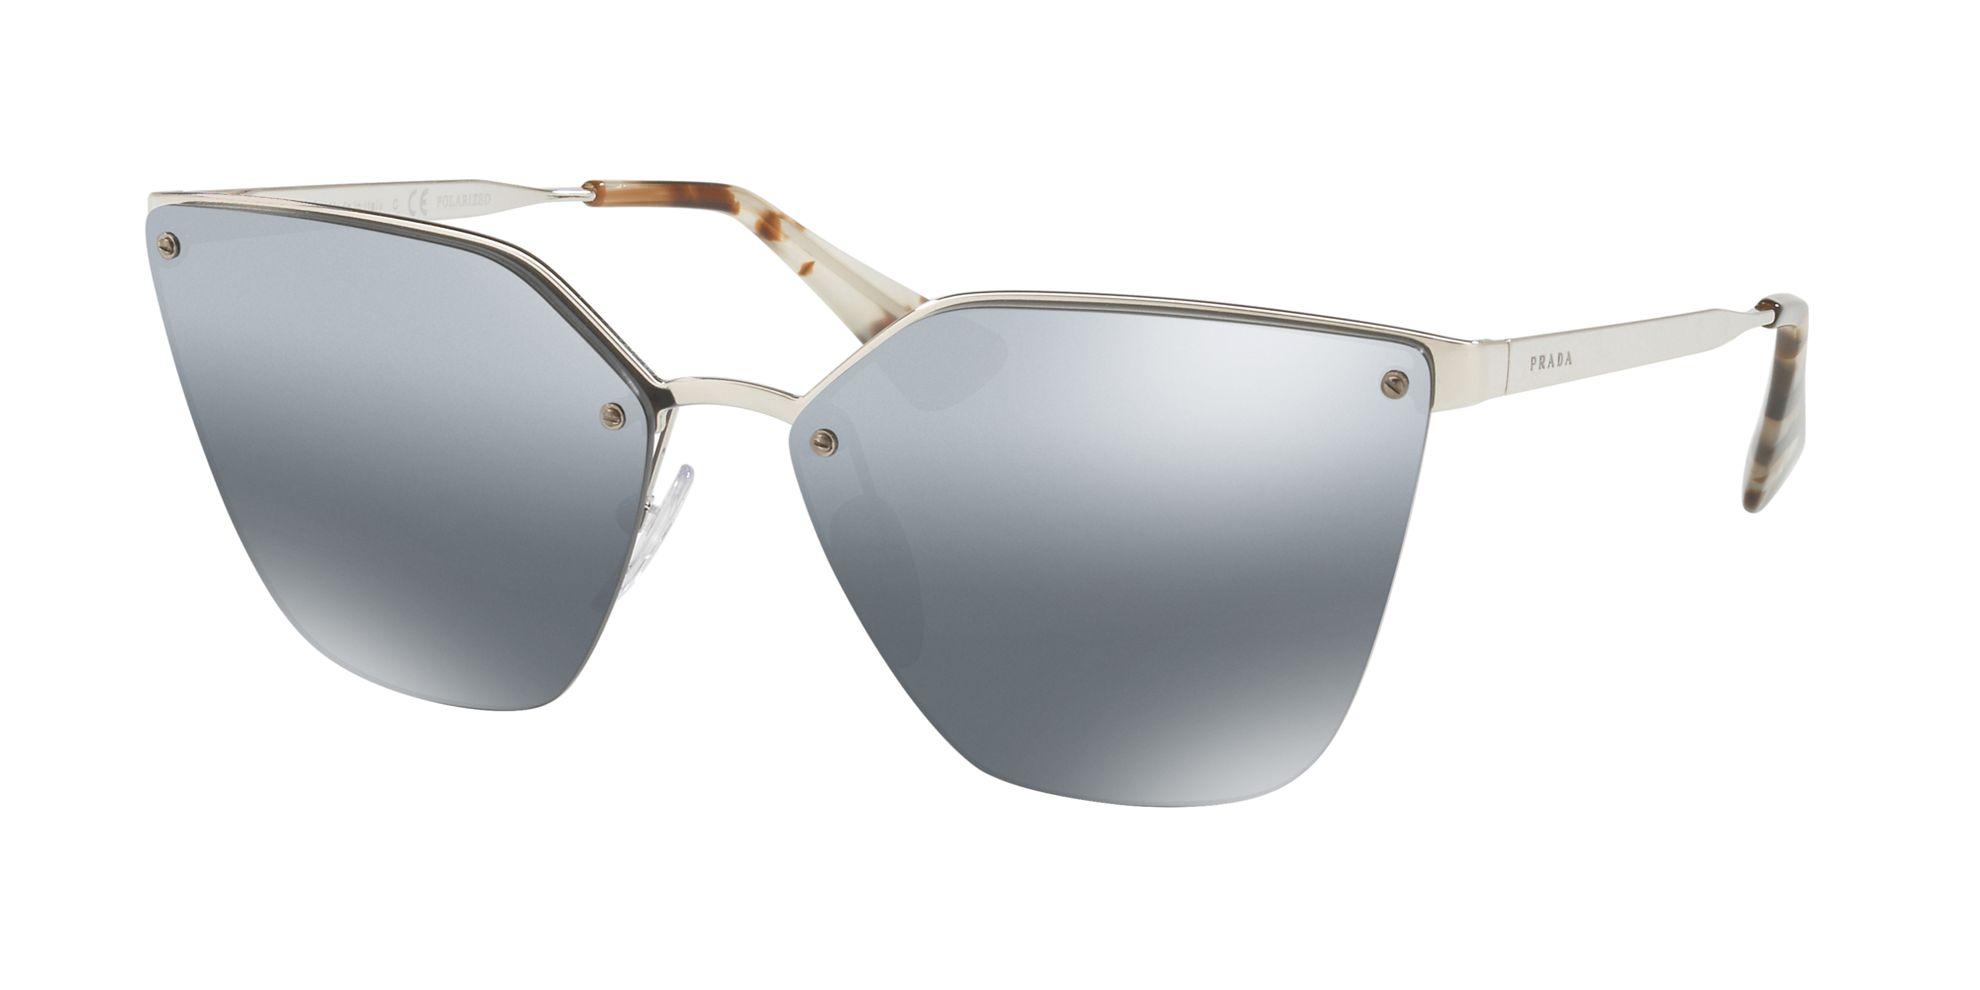 0312c6f58af9 Vision In Style - Choose from various designer sunglasses ...